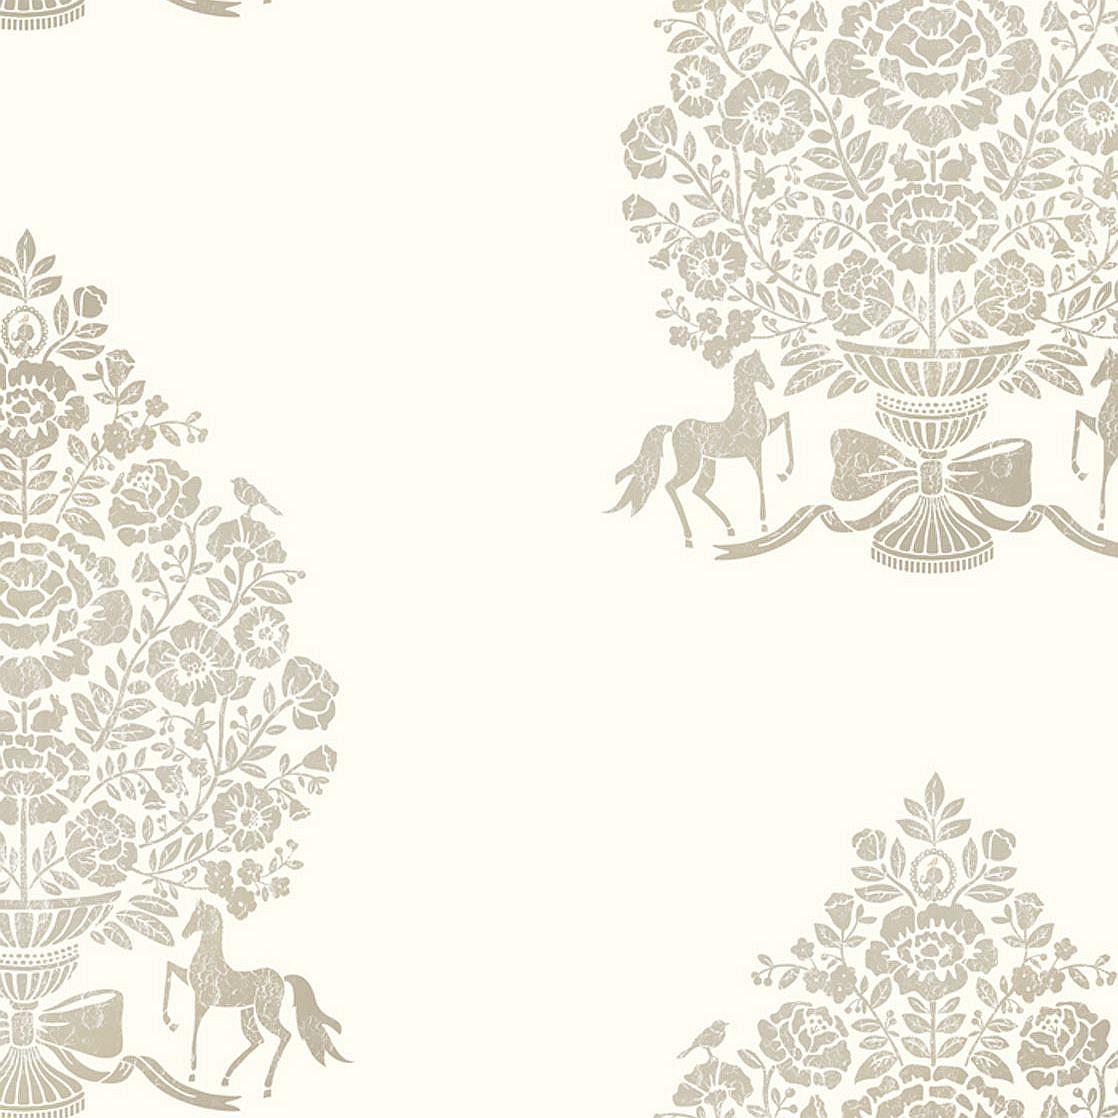 vliestapete eijffinger pip 3 ornamente pferde 341050. Black Bedroom Furniture Sets. Home Design Ideas